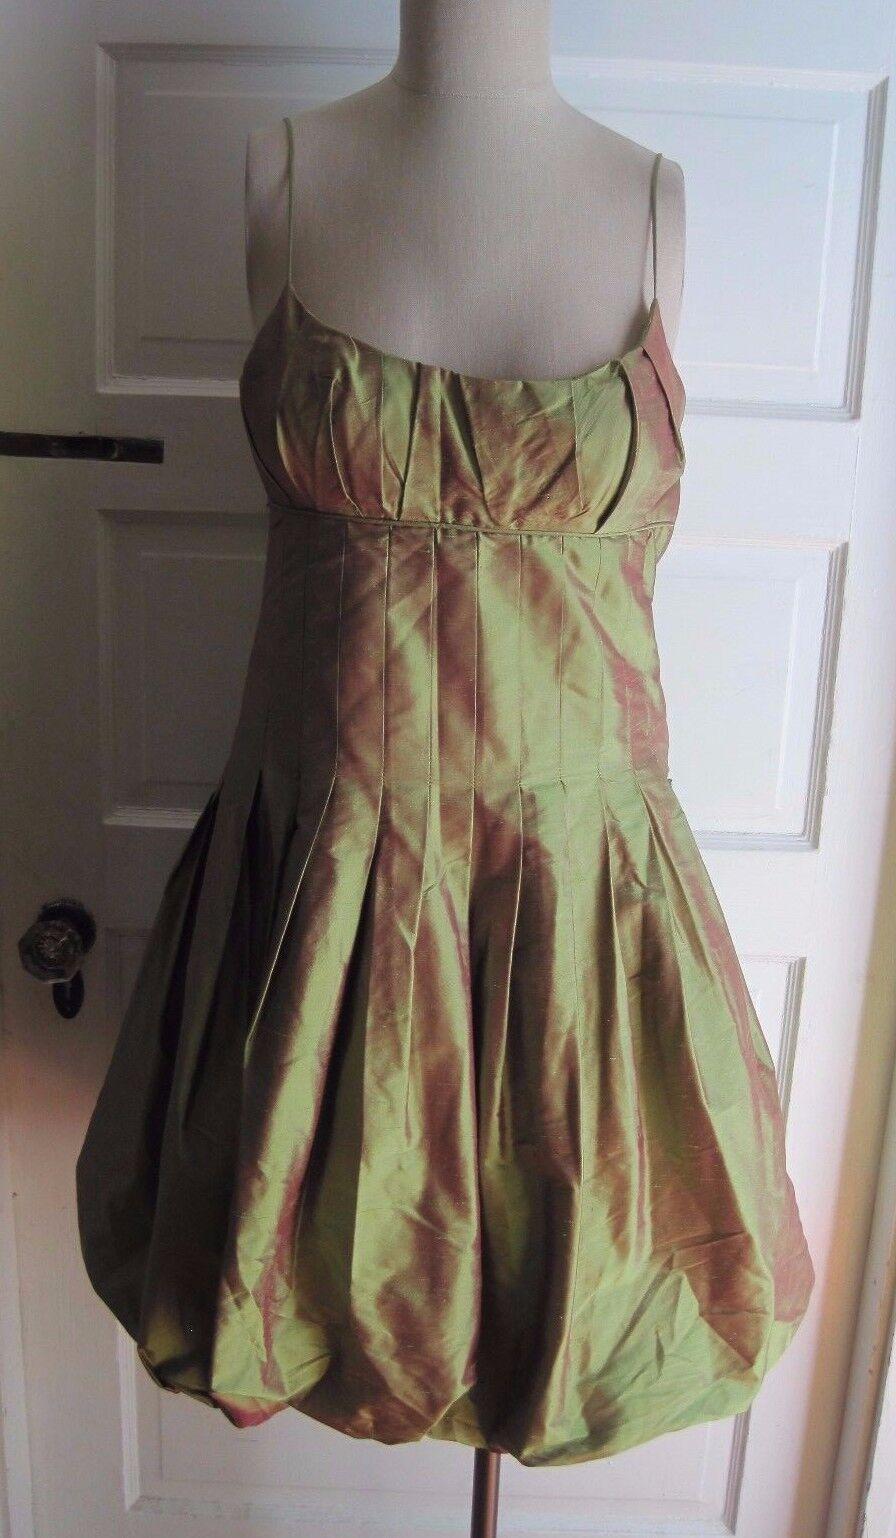 Nicole Miler New York City 100% Seide Metallisch Schimmernd Ballonkleid Damen 2